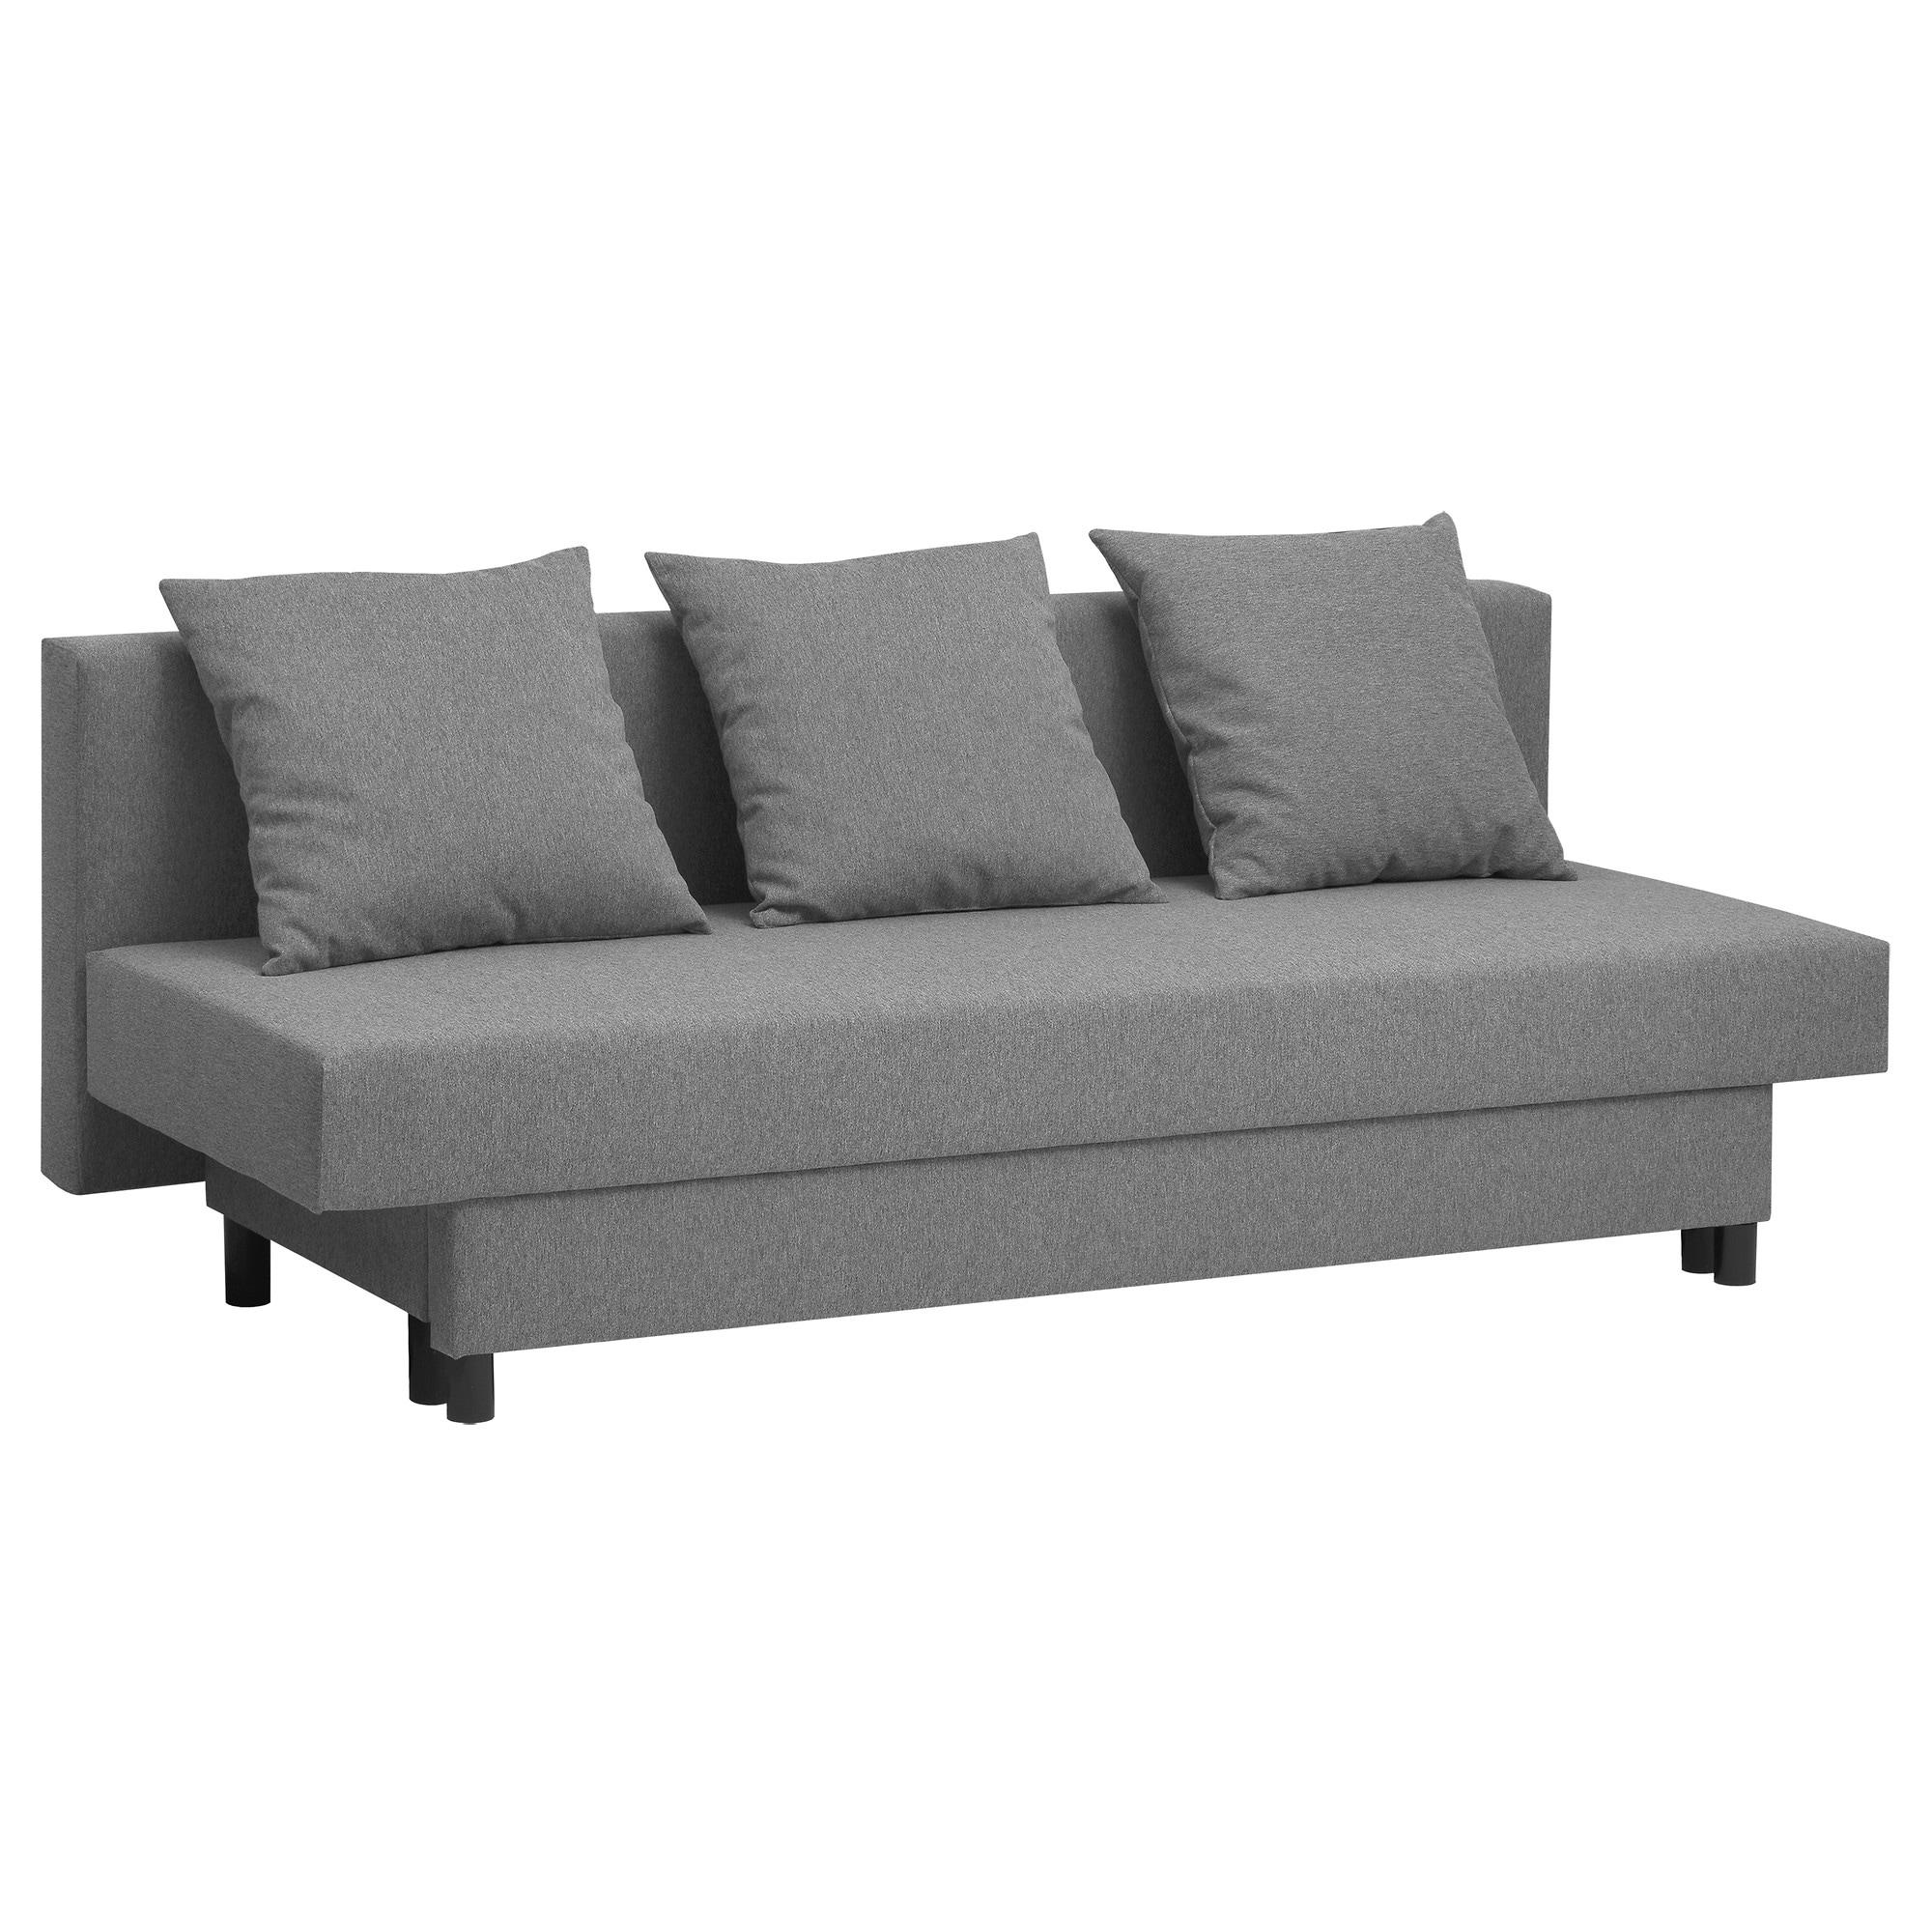 Sofa Cama Desplegable Dddy sofà S Cama De Calidad Pra Online Ikea